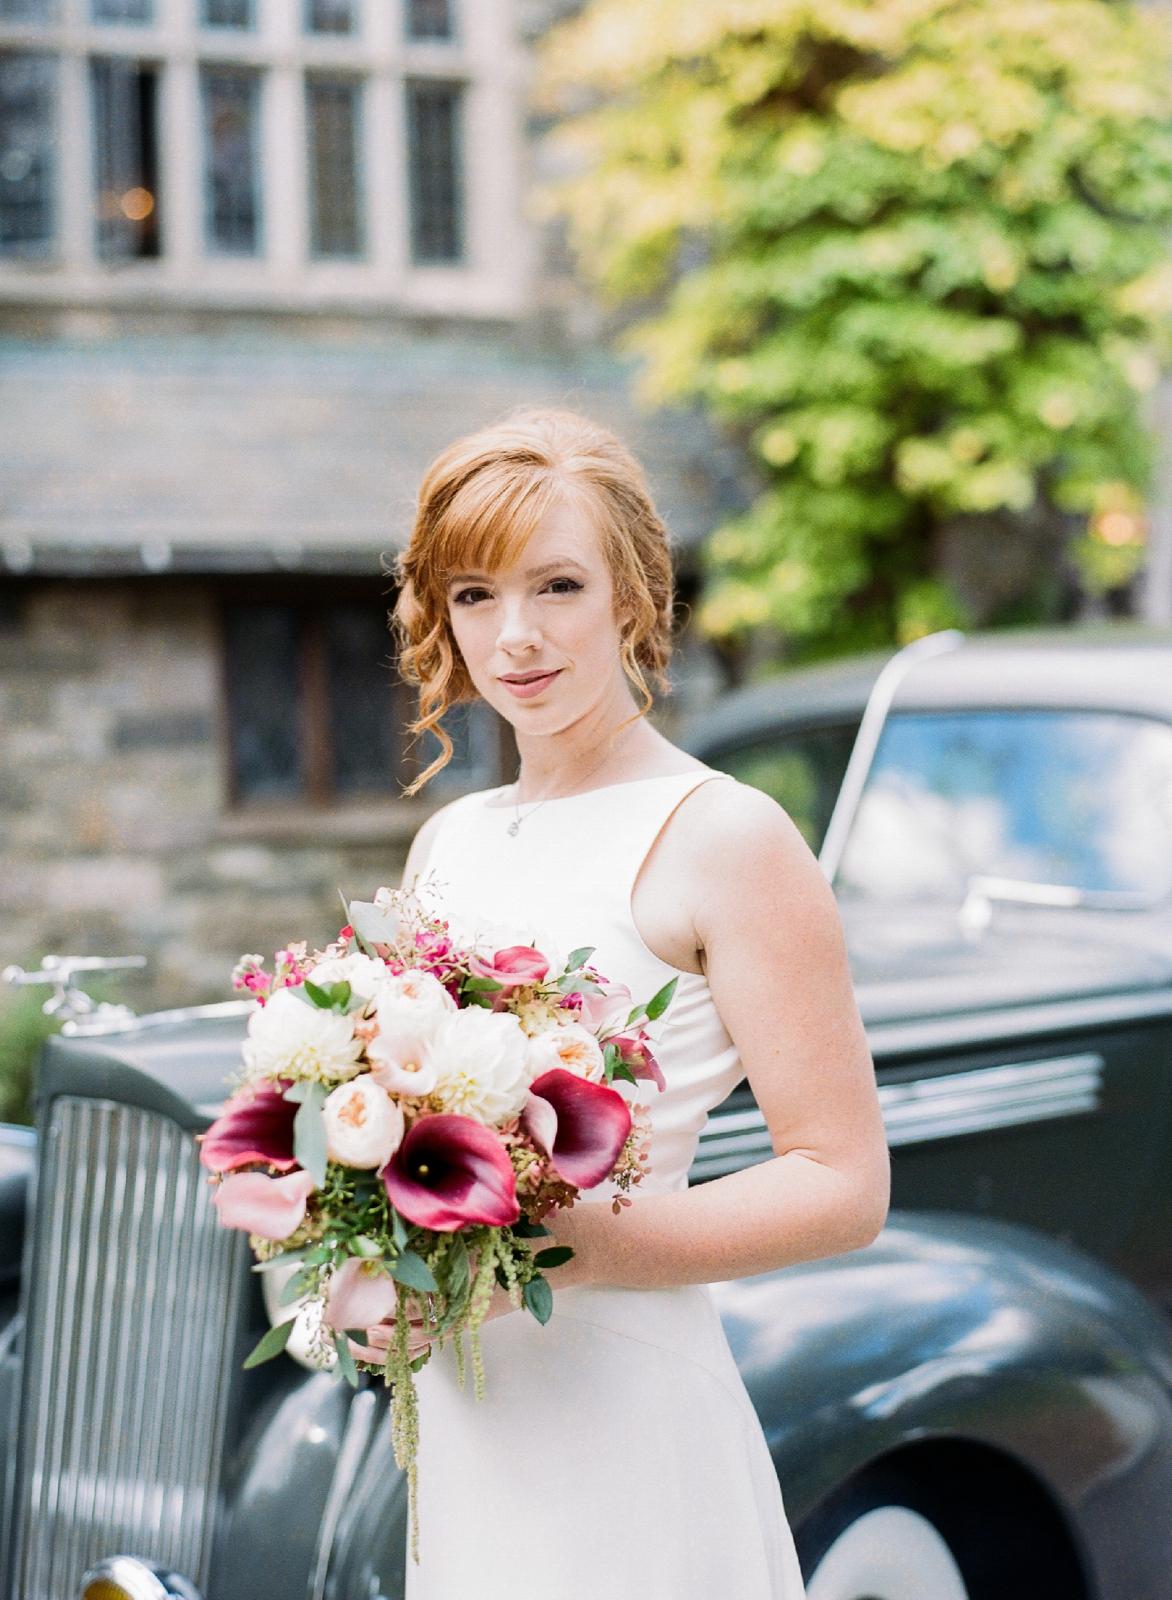 ringwood new jersey wedding photographer shannon griffin_0010.jpg